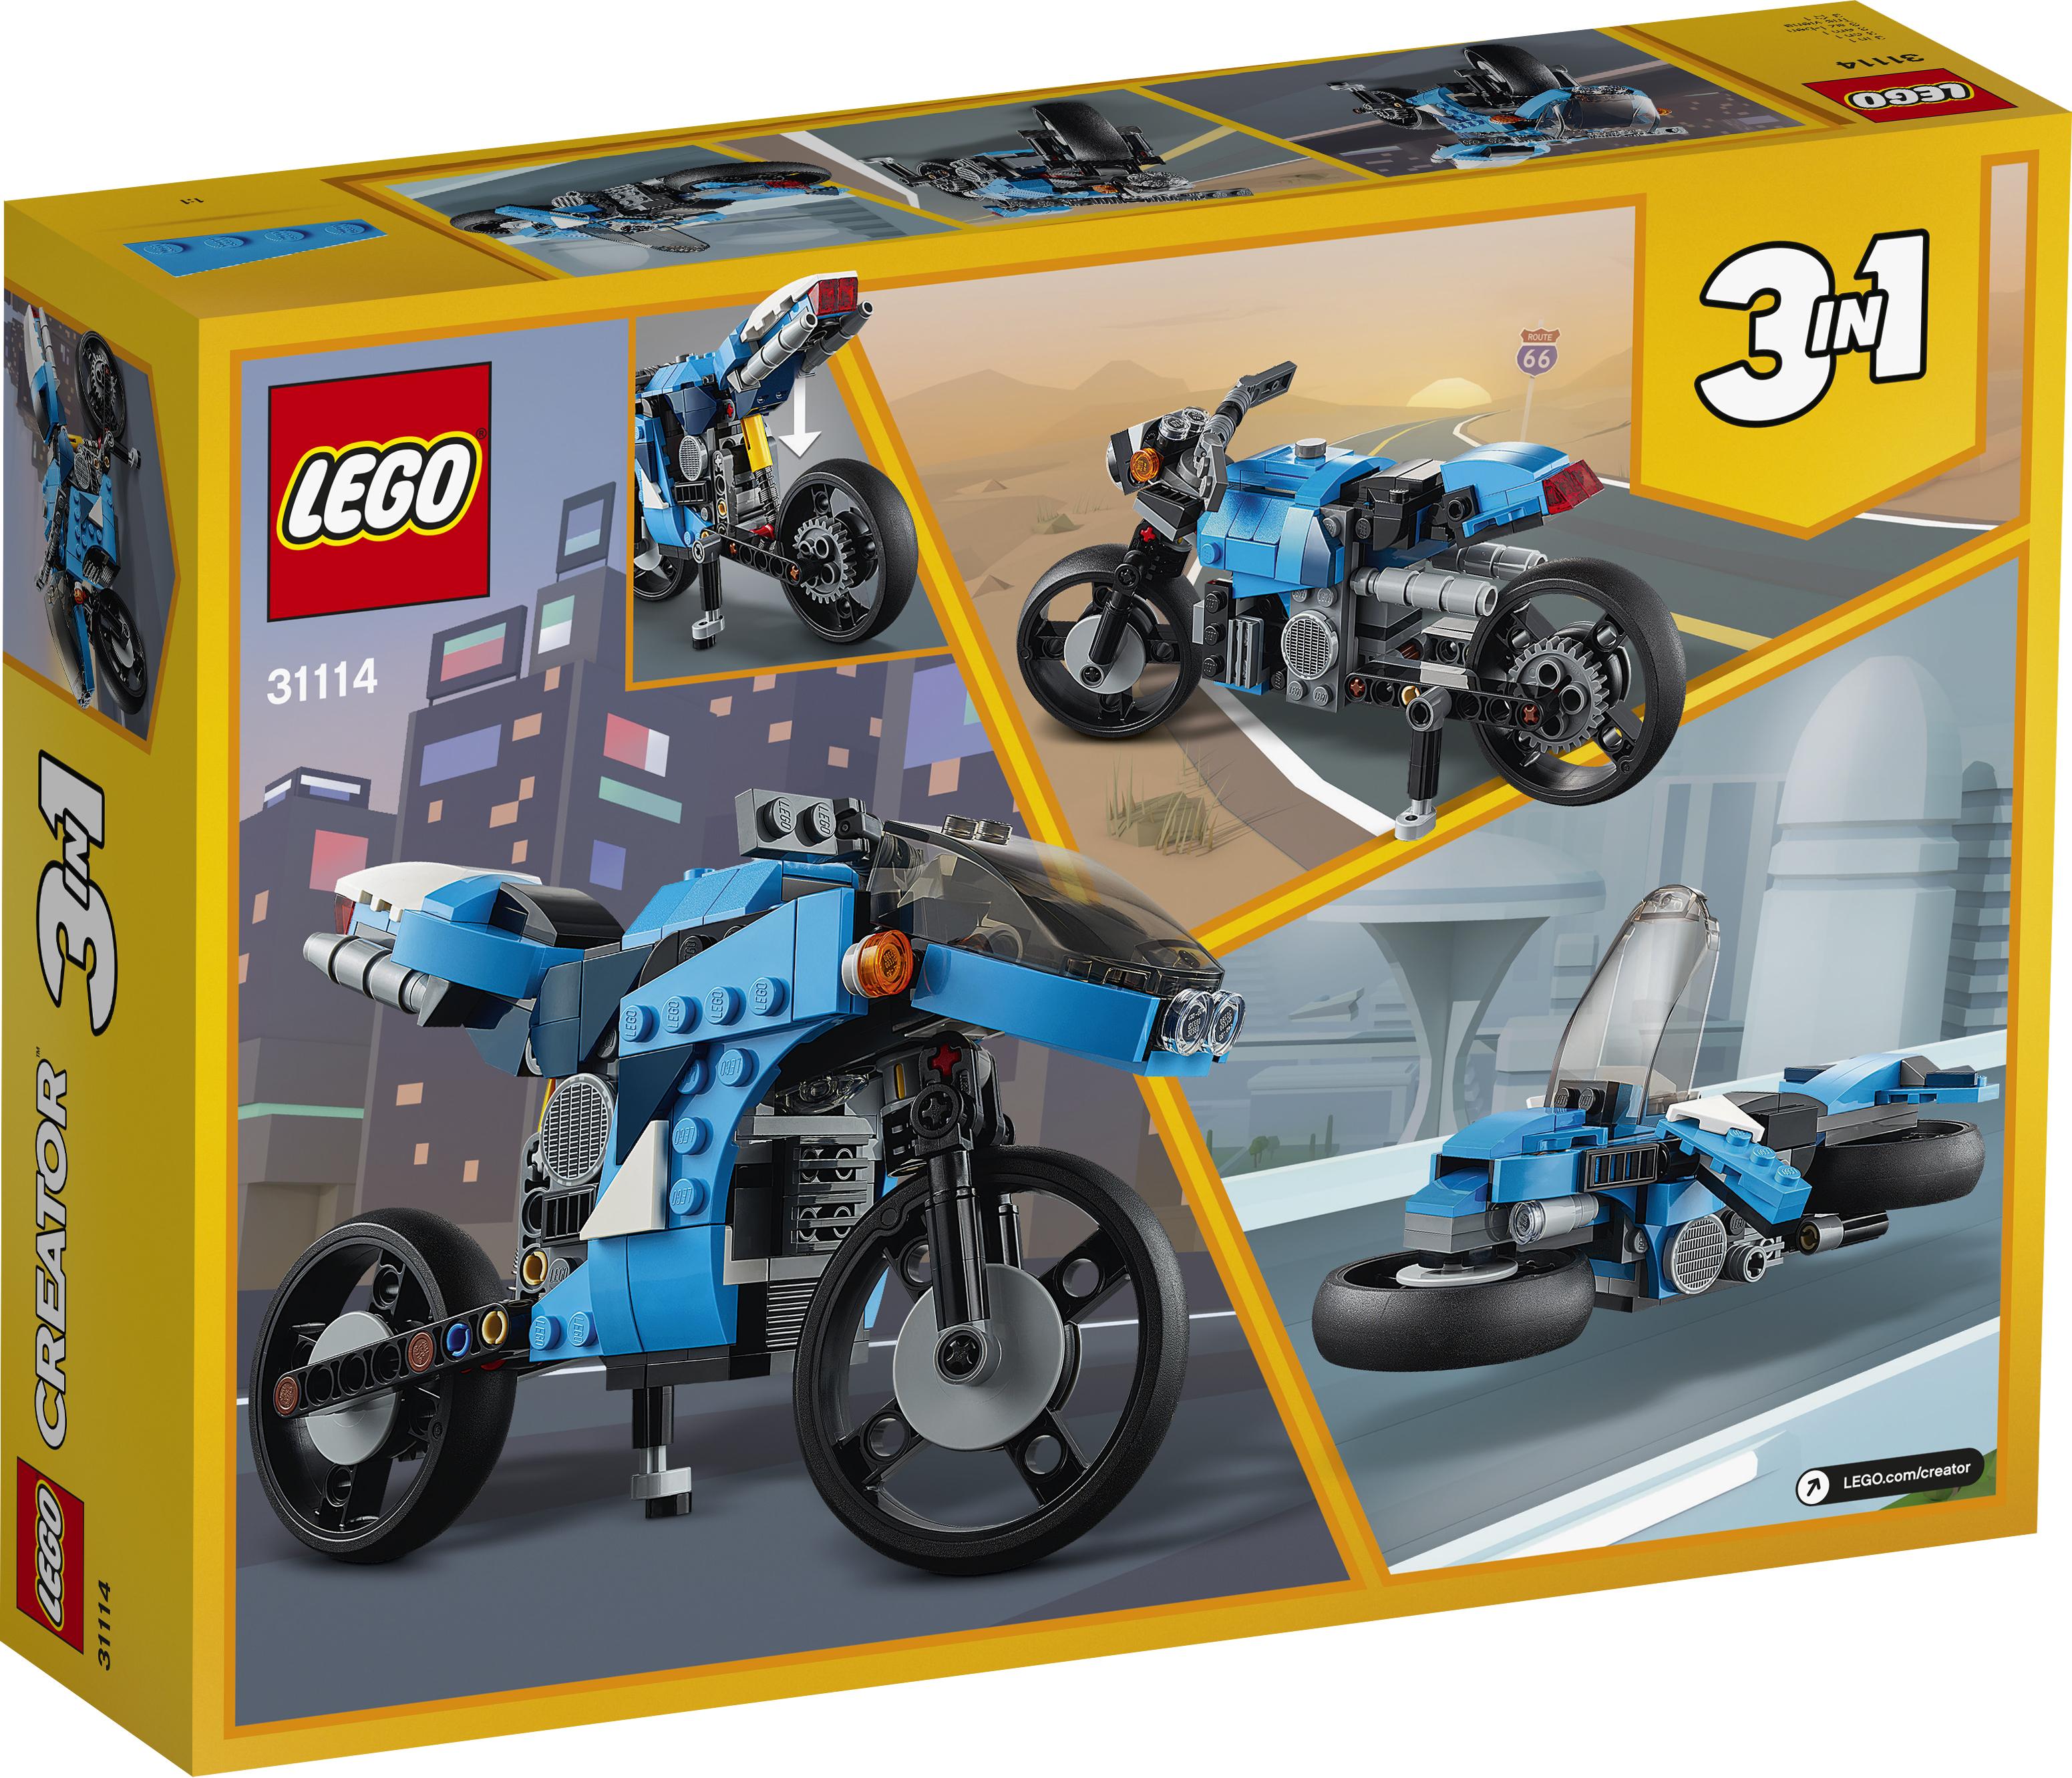 LEGO Creator Supermotorcykel - 31114